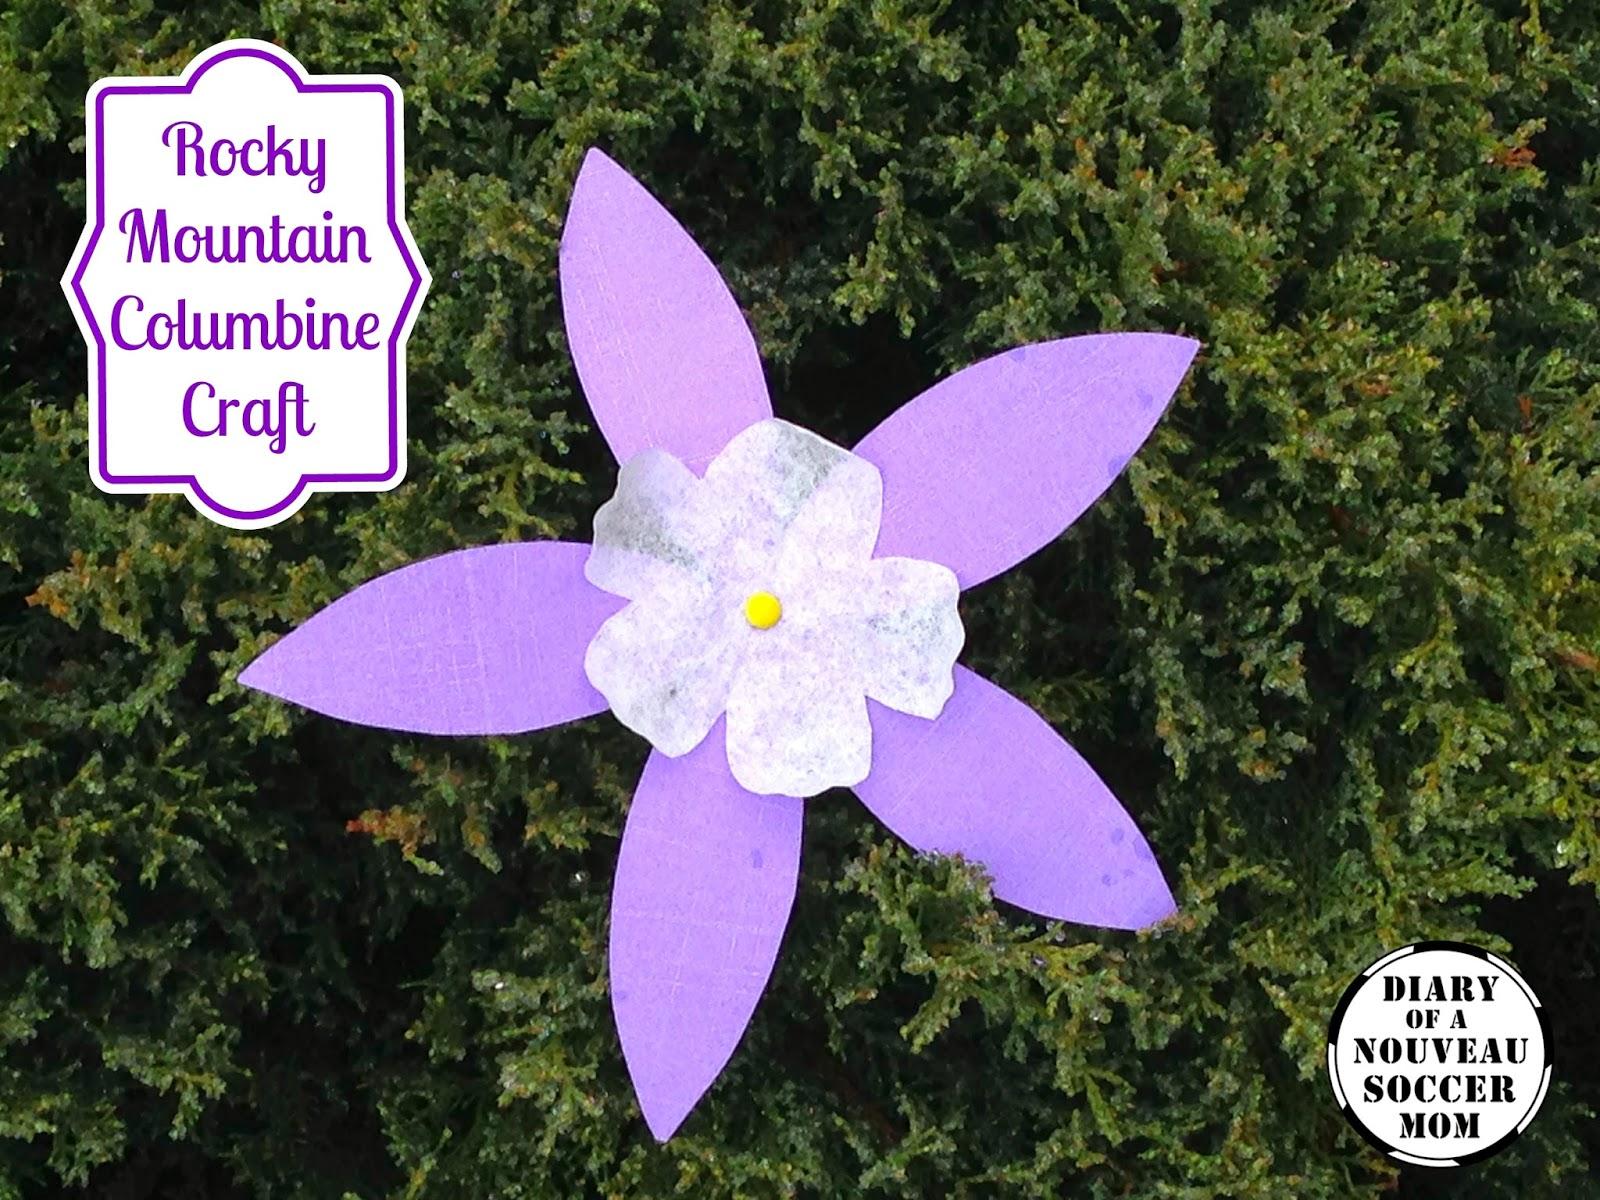 The diary of a nouveau soccer mom flower craft for kids rocky flower craft for kids rocky mountain columbine izmirmasajfo